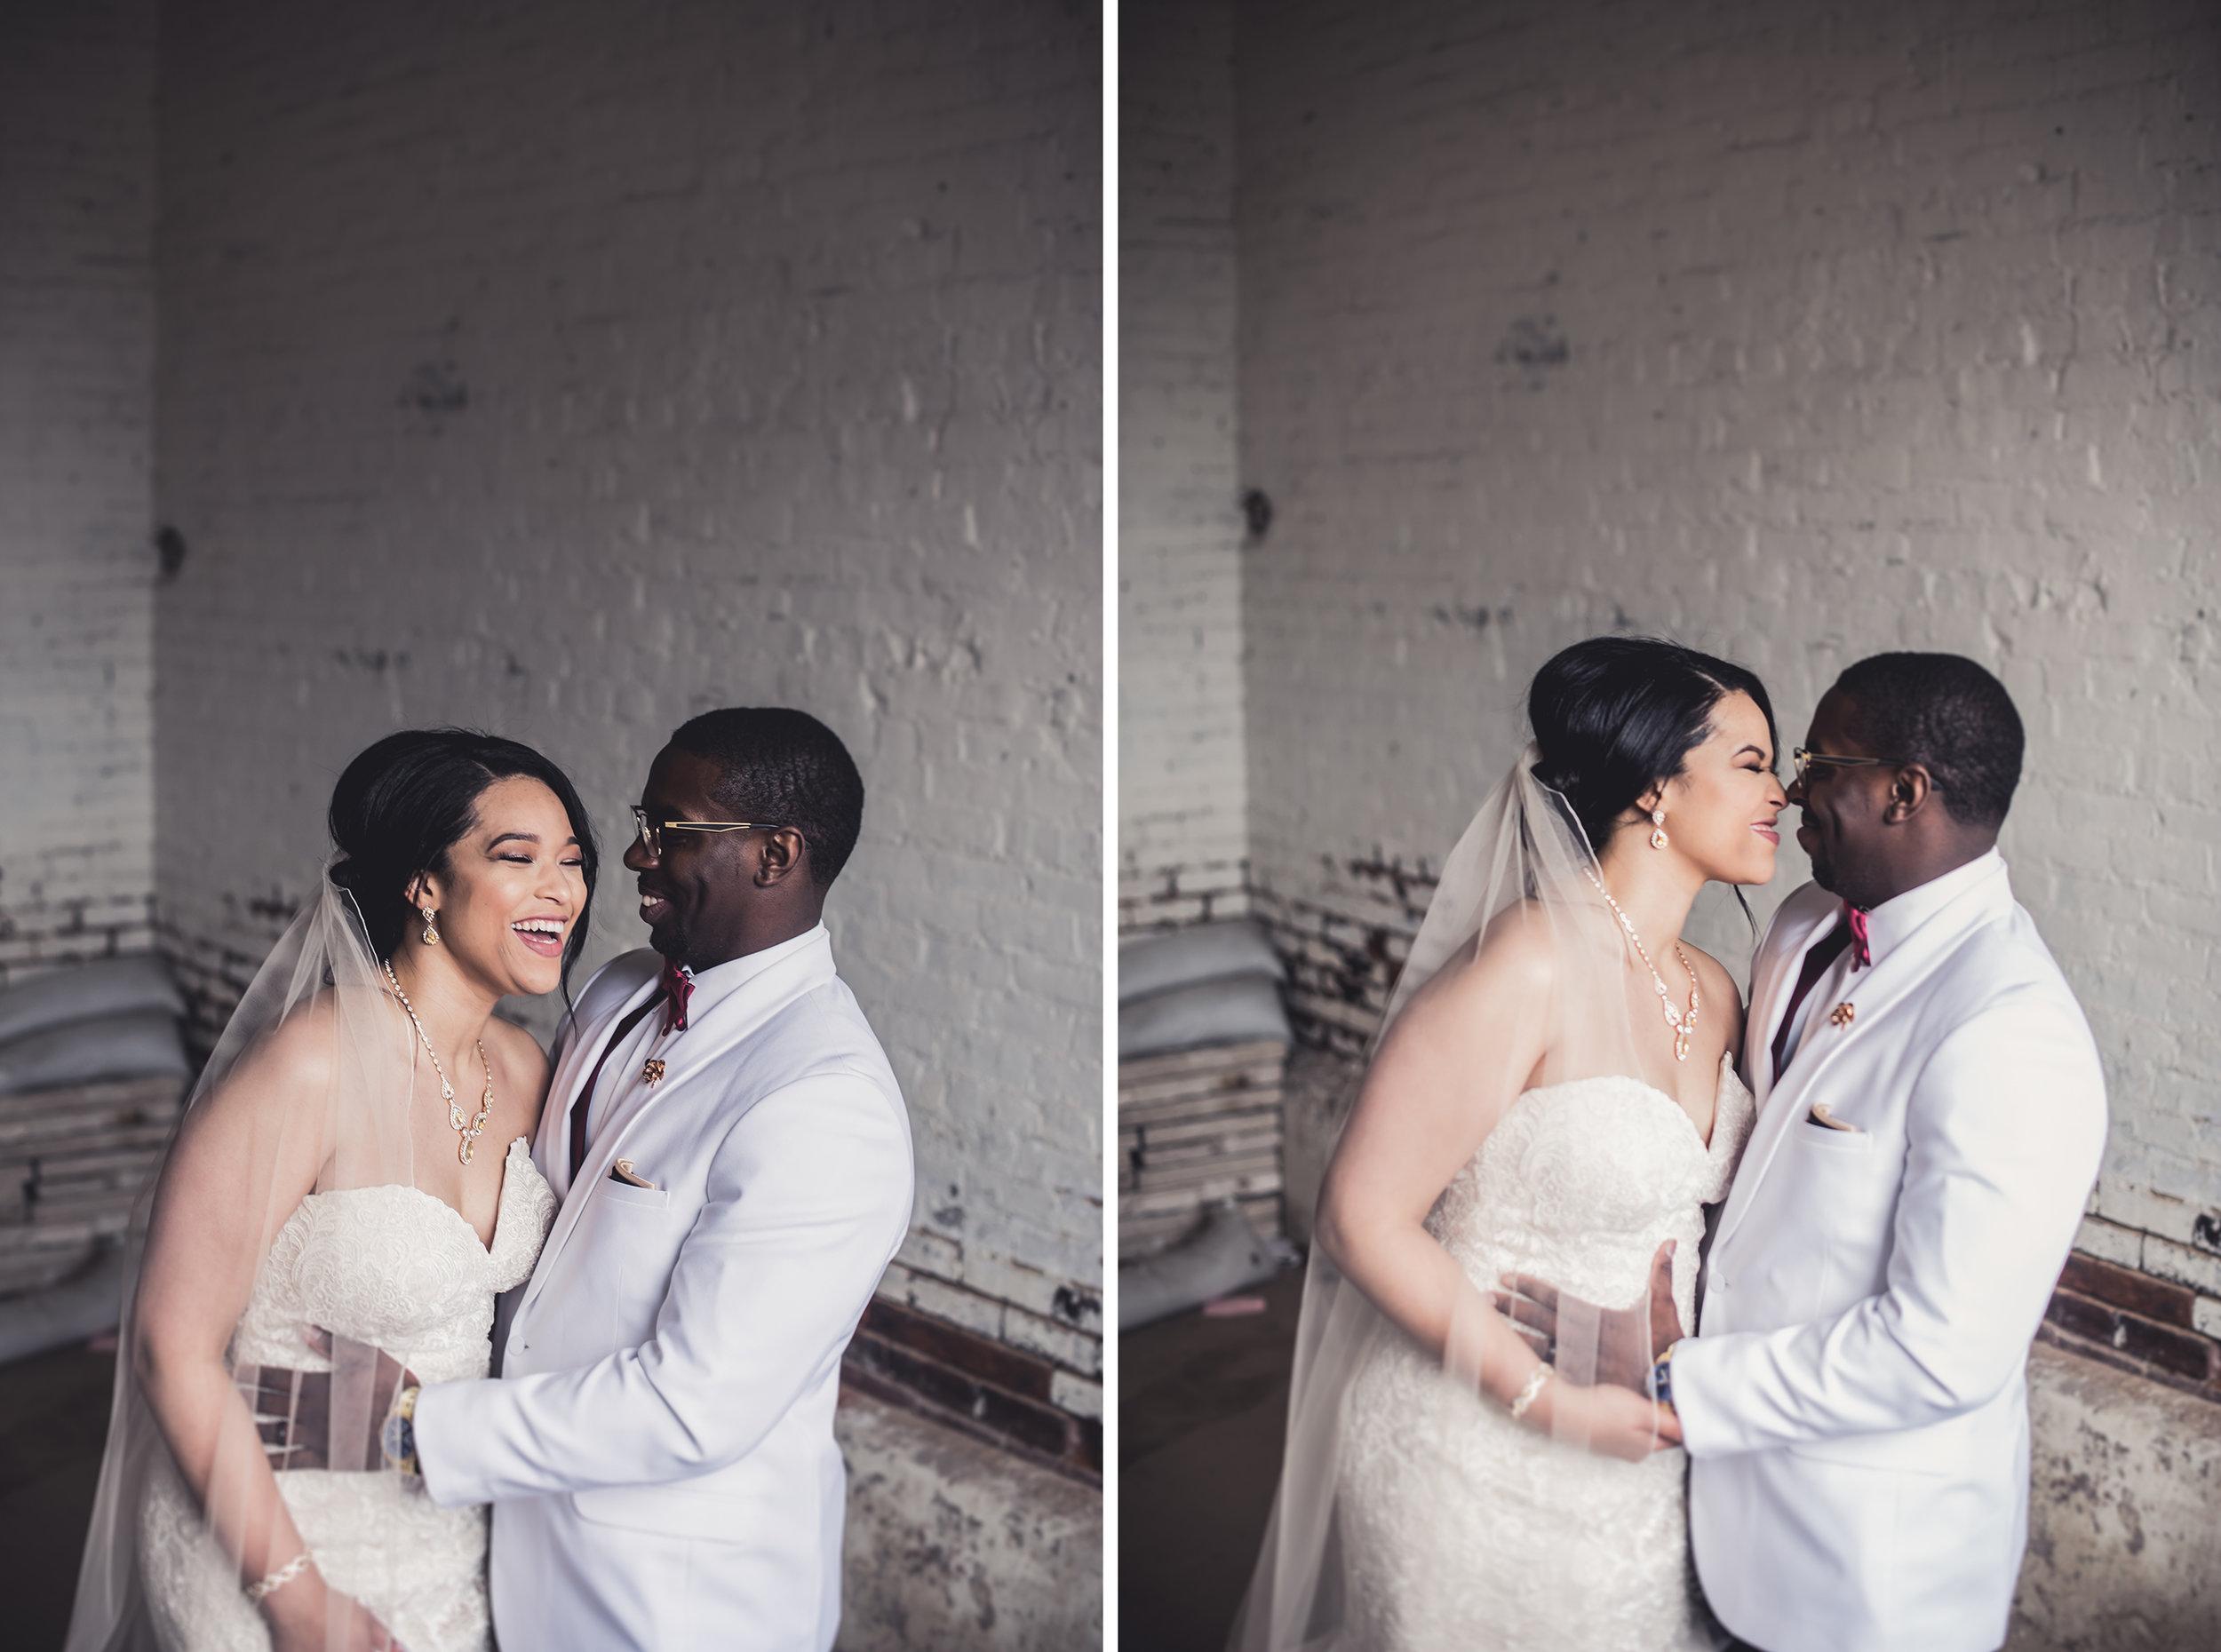 Burlington Iowa Wedding Midwest Photographer Melissa Cervantes _ Chantelle and Isaiah 320h.jpg